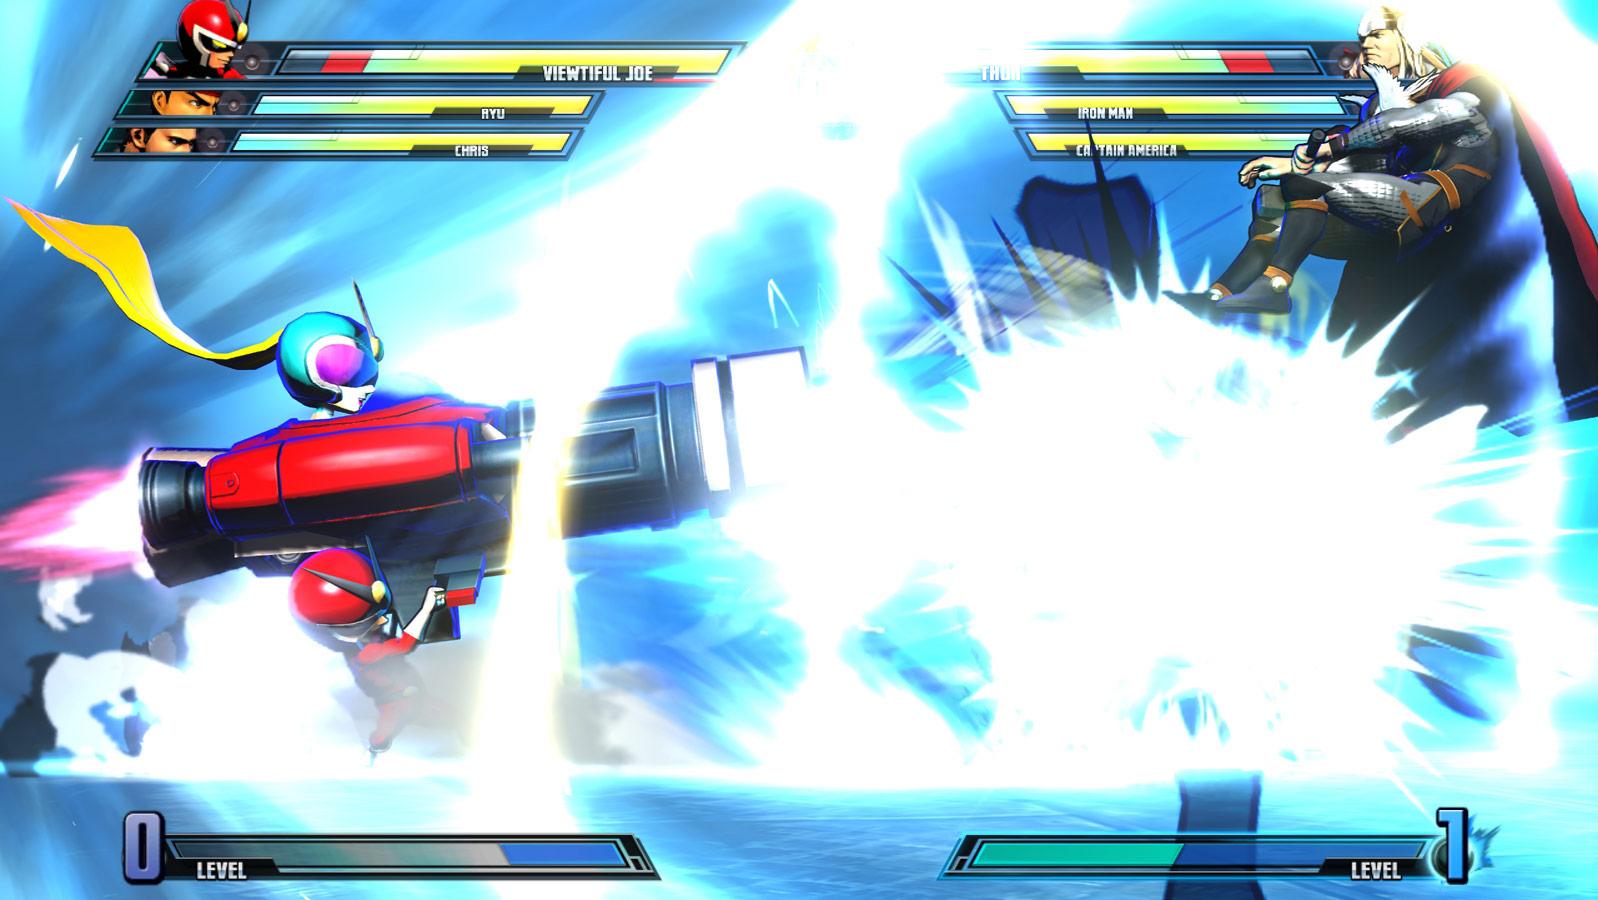 Marvel vs. Capcom 3 screen shot Aug. 18 image #6